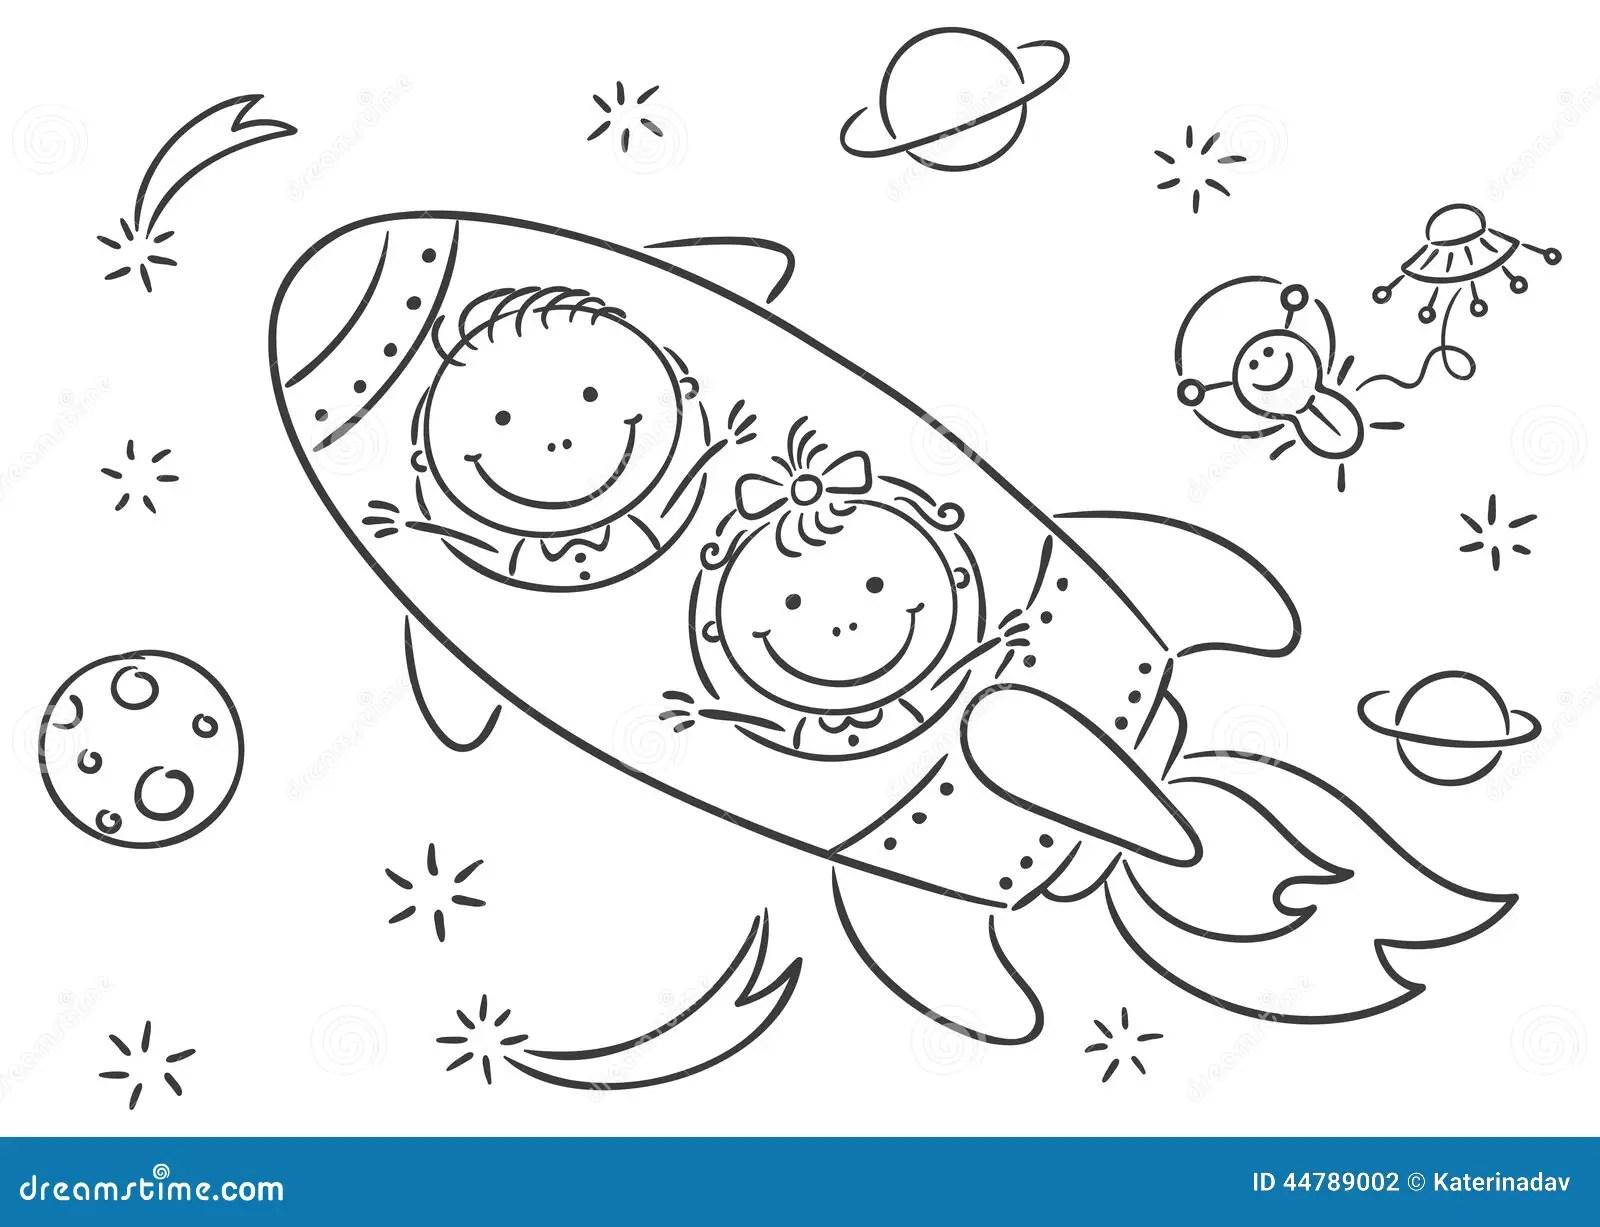 Kinder Raum Erforschen Vektor Abbildung